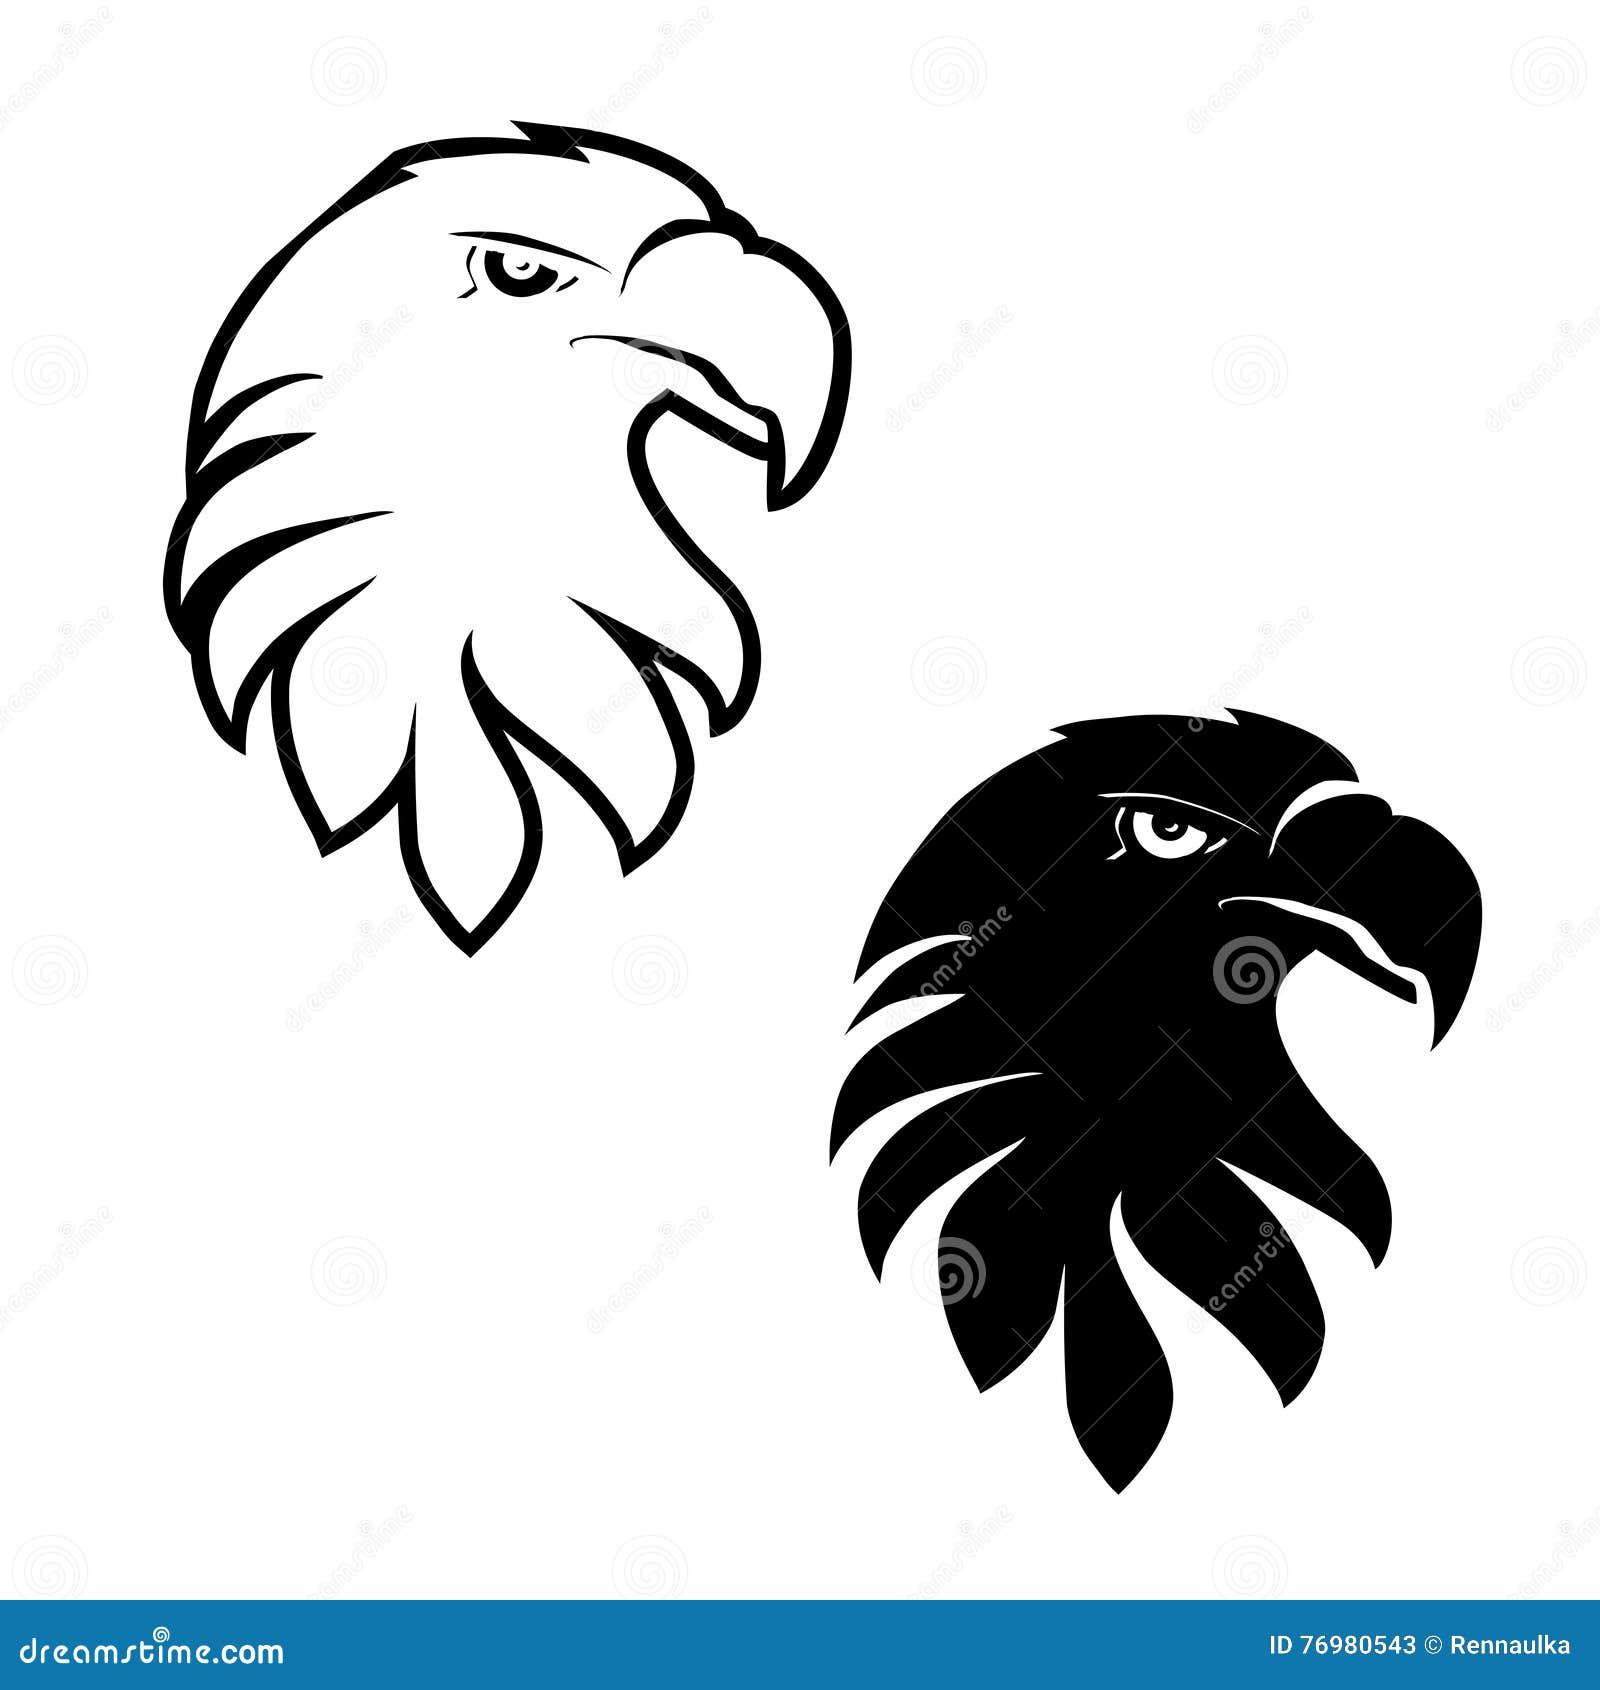 Symbols of eagle black sketch head stock vector illustration of symbols of eagle black sketch head biocorpaavc Images